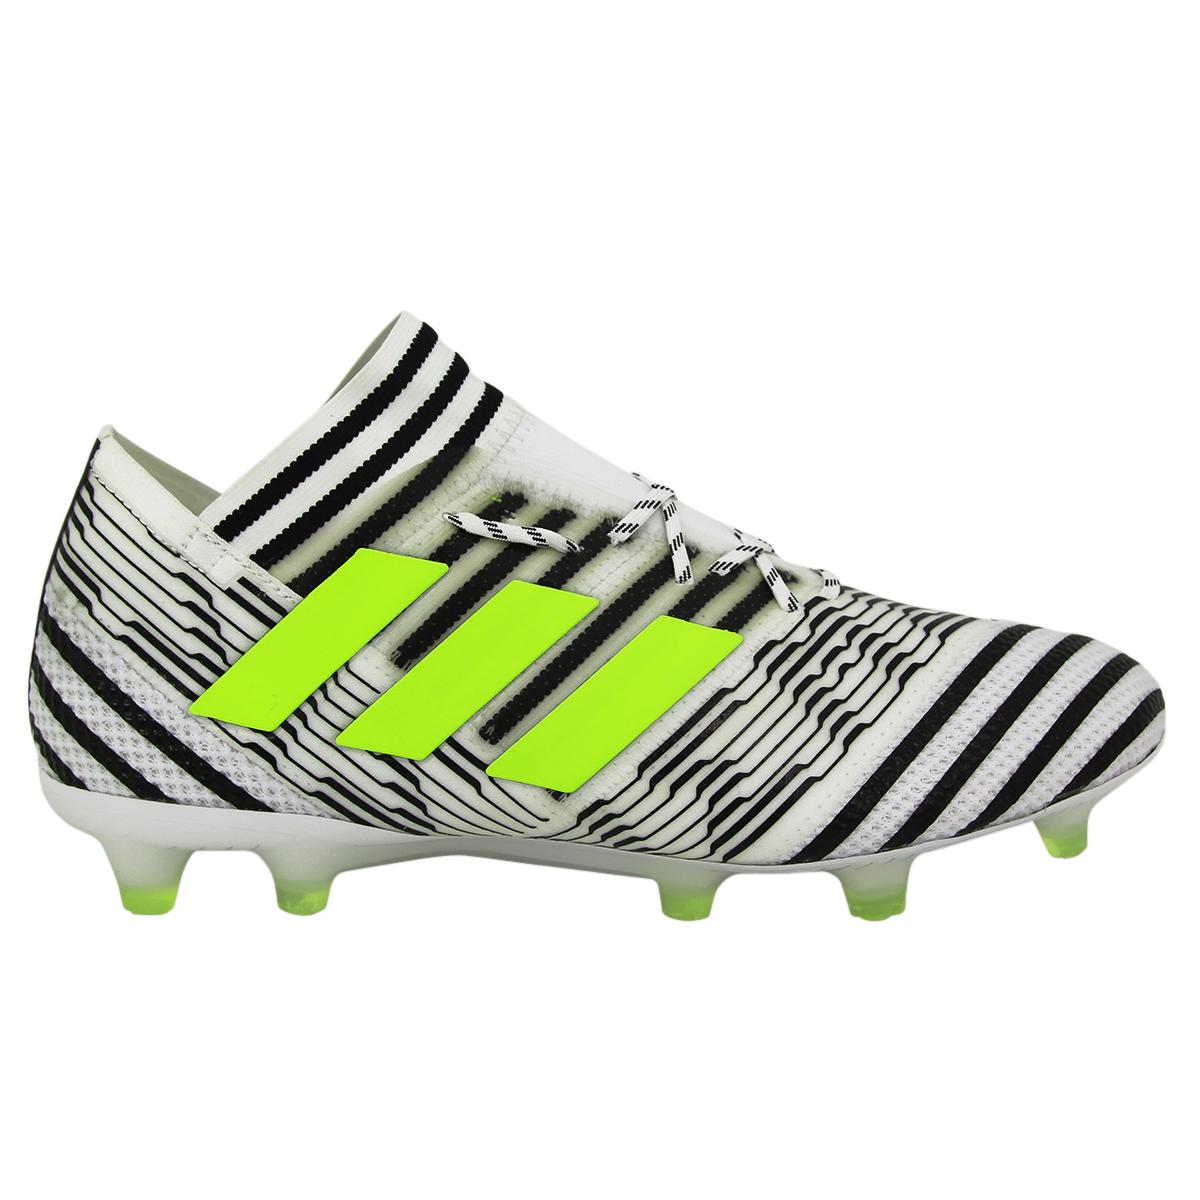 Adidas NEMEZIZ 17.1 FIRM GROUND Zapatos de Fútbol Para Hombre nuevo